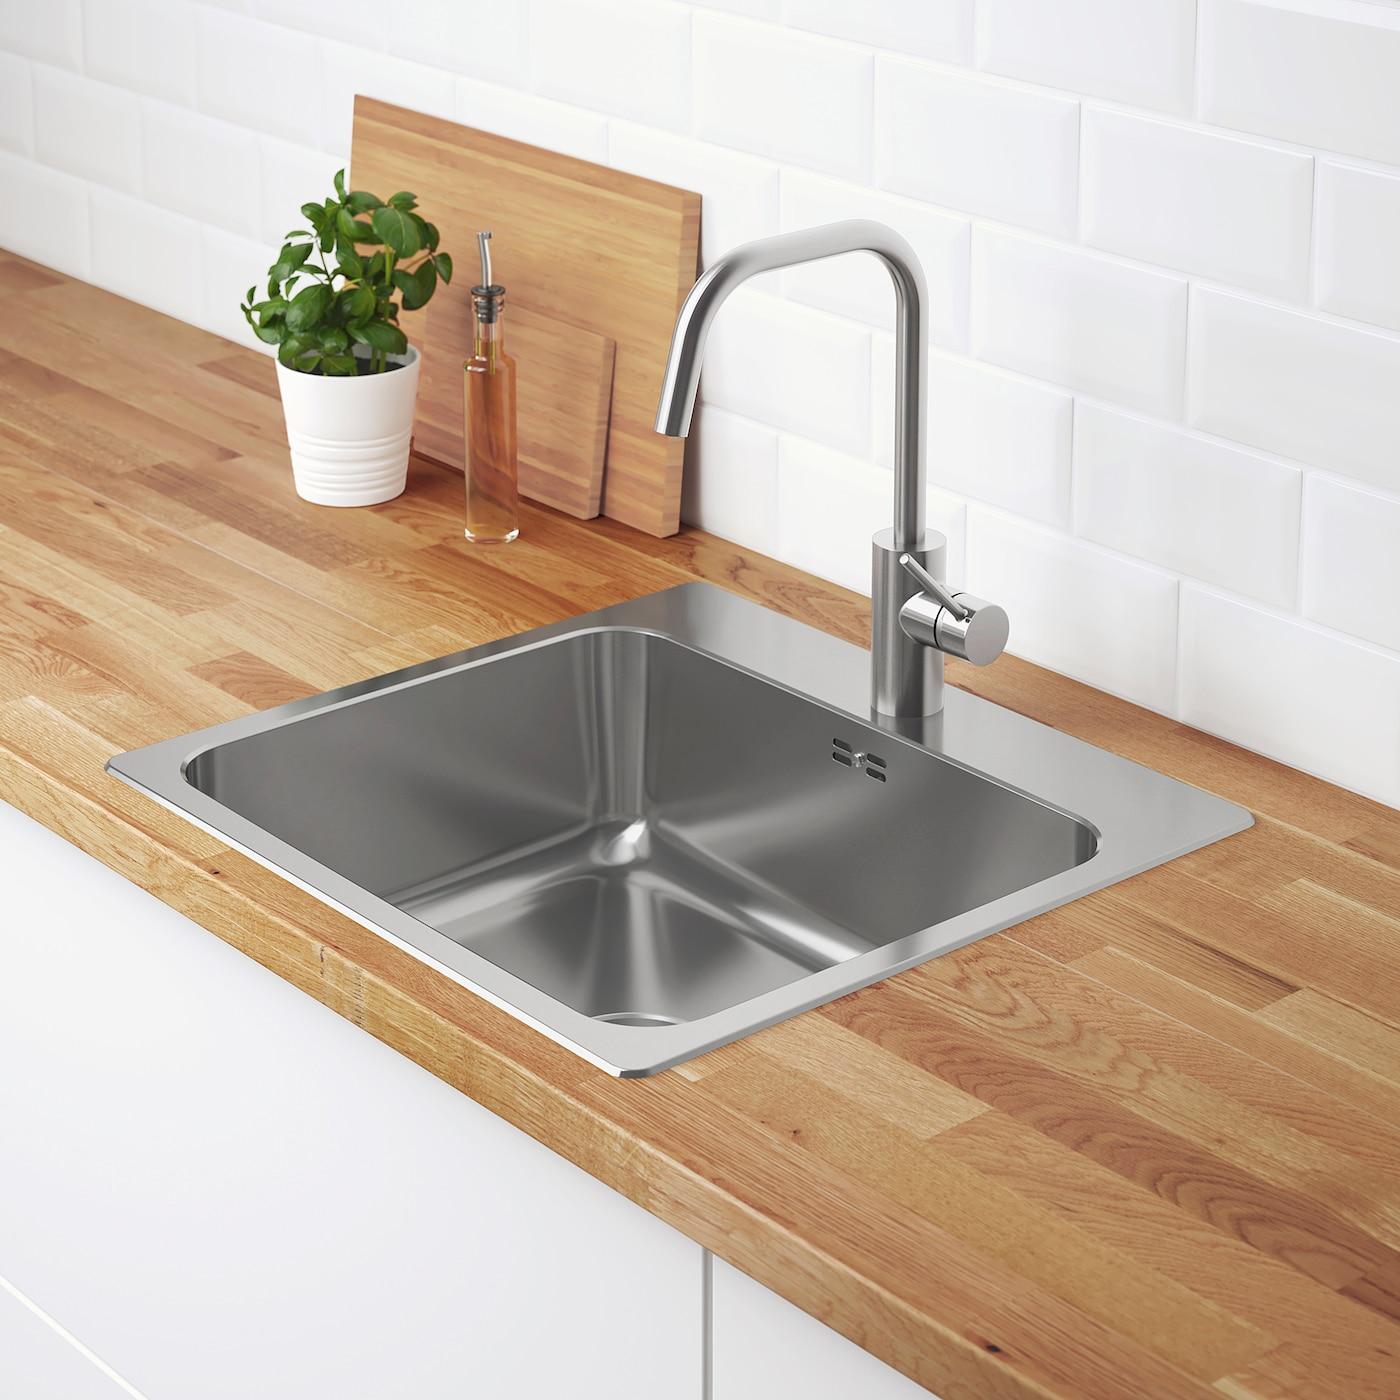 LÅNGUDDEN Inset sink, 4 bowl - stainless steel 4x4 cm